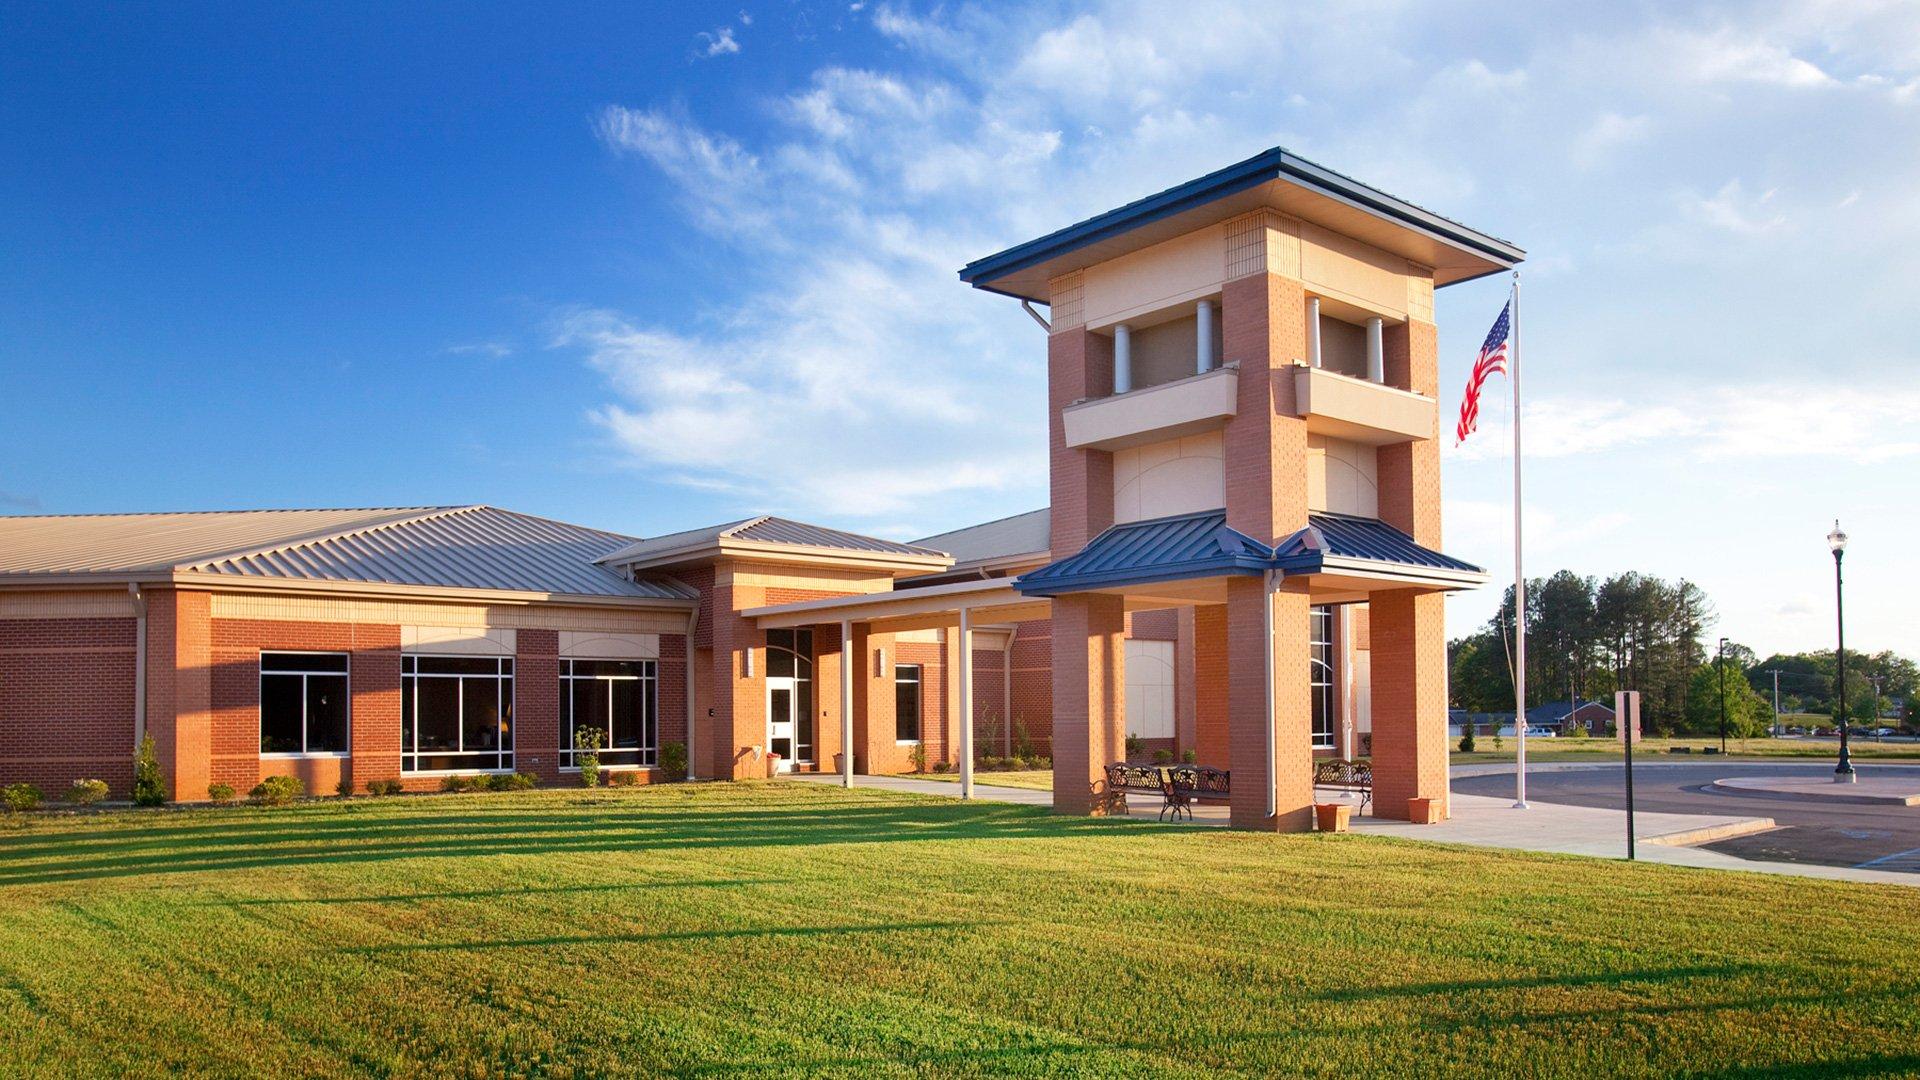 Blue Ridge Elementary School, School District of Oconee County